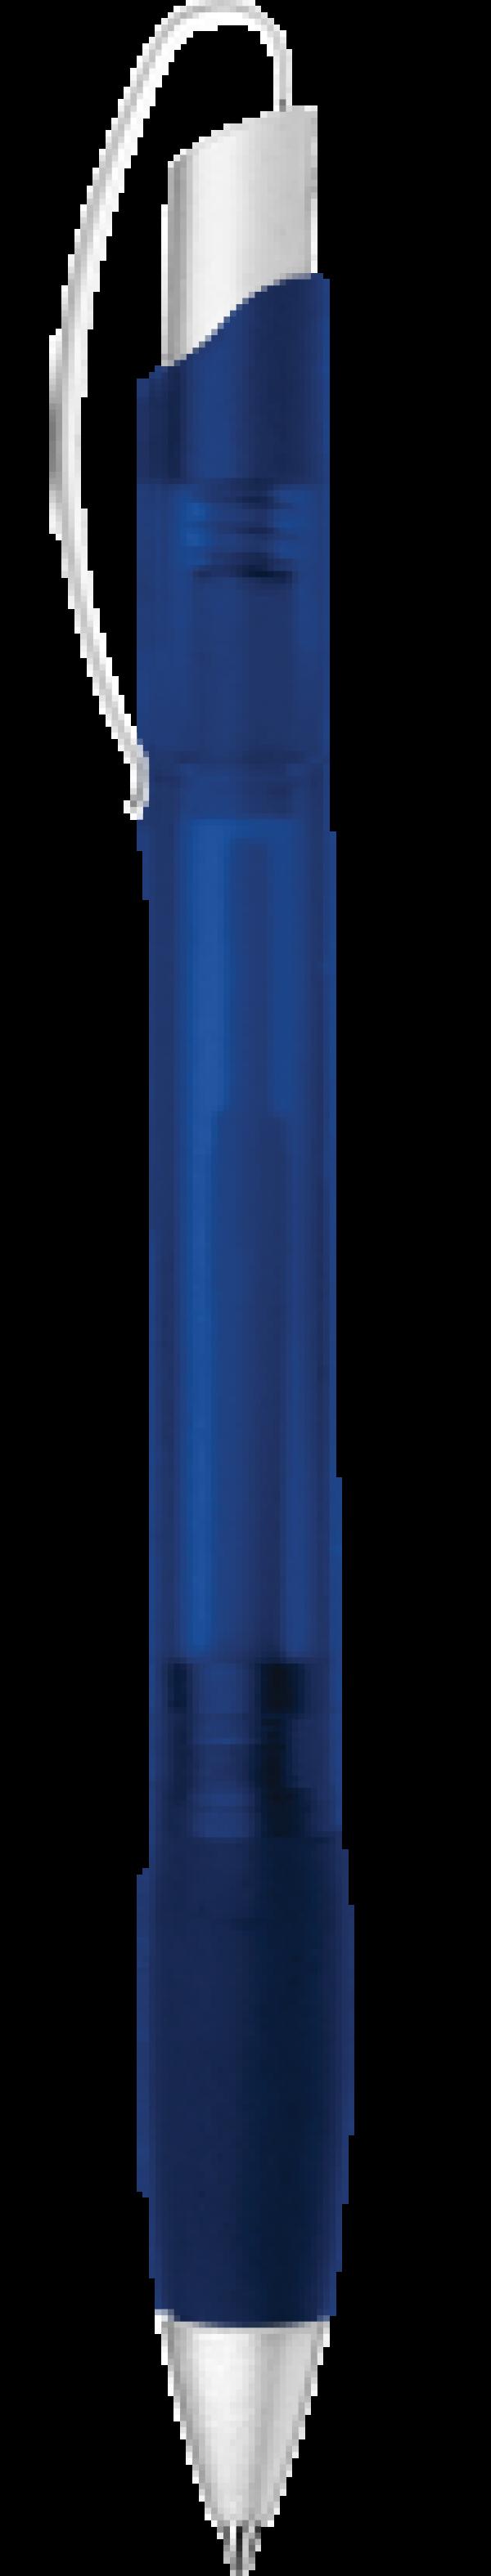 Шариковая ручка b 0-0012 TF-SI ENERGY frozen